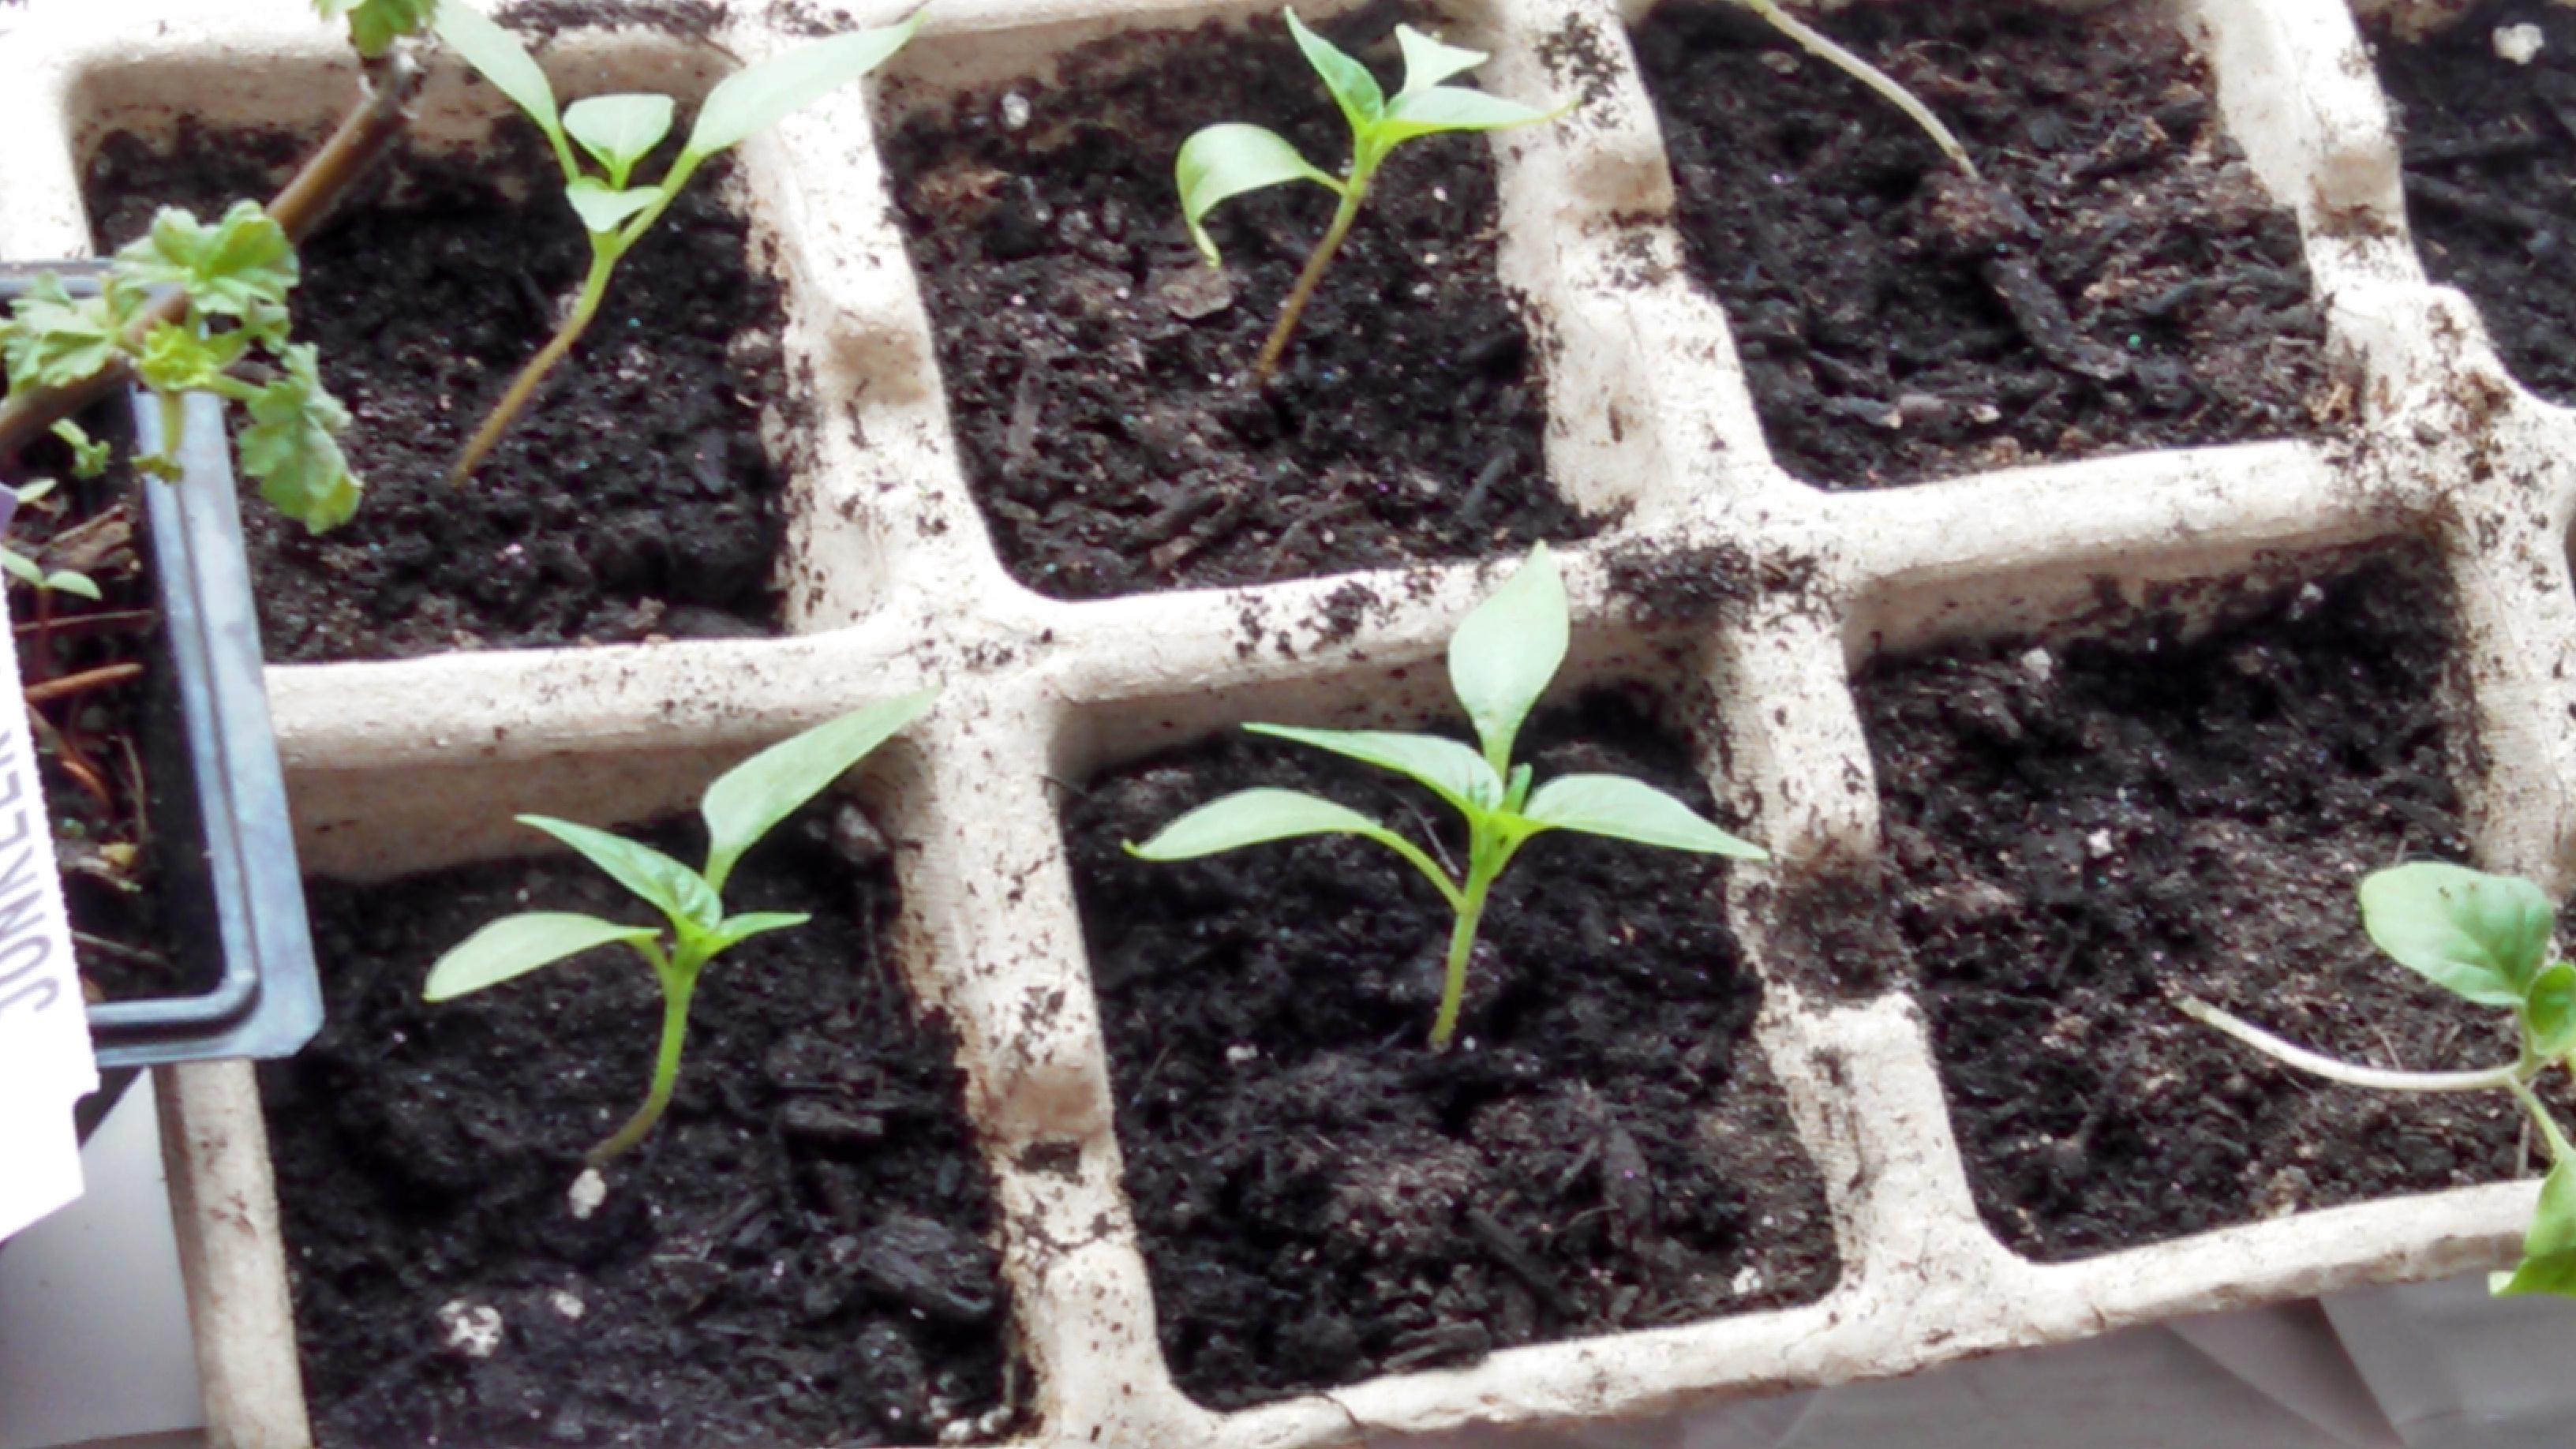 Victory Garden Update: Seed Starting!